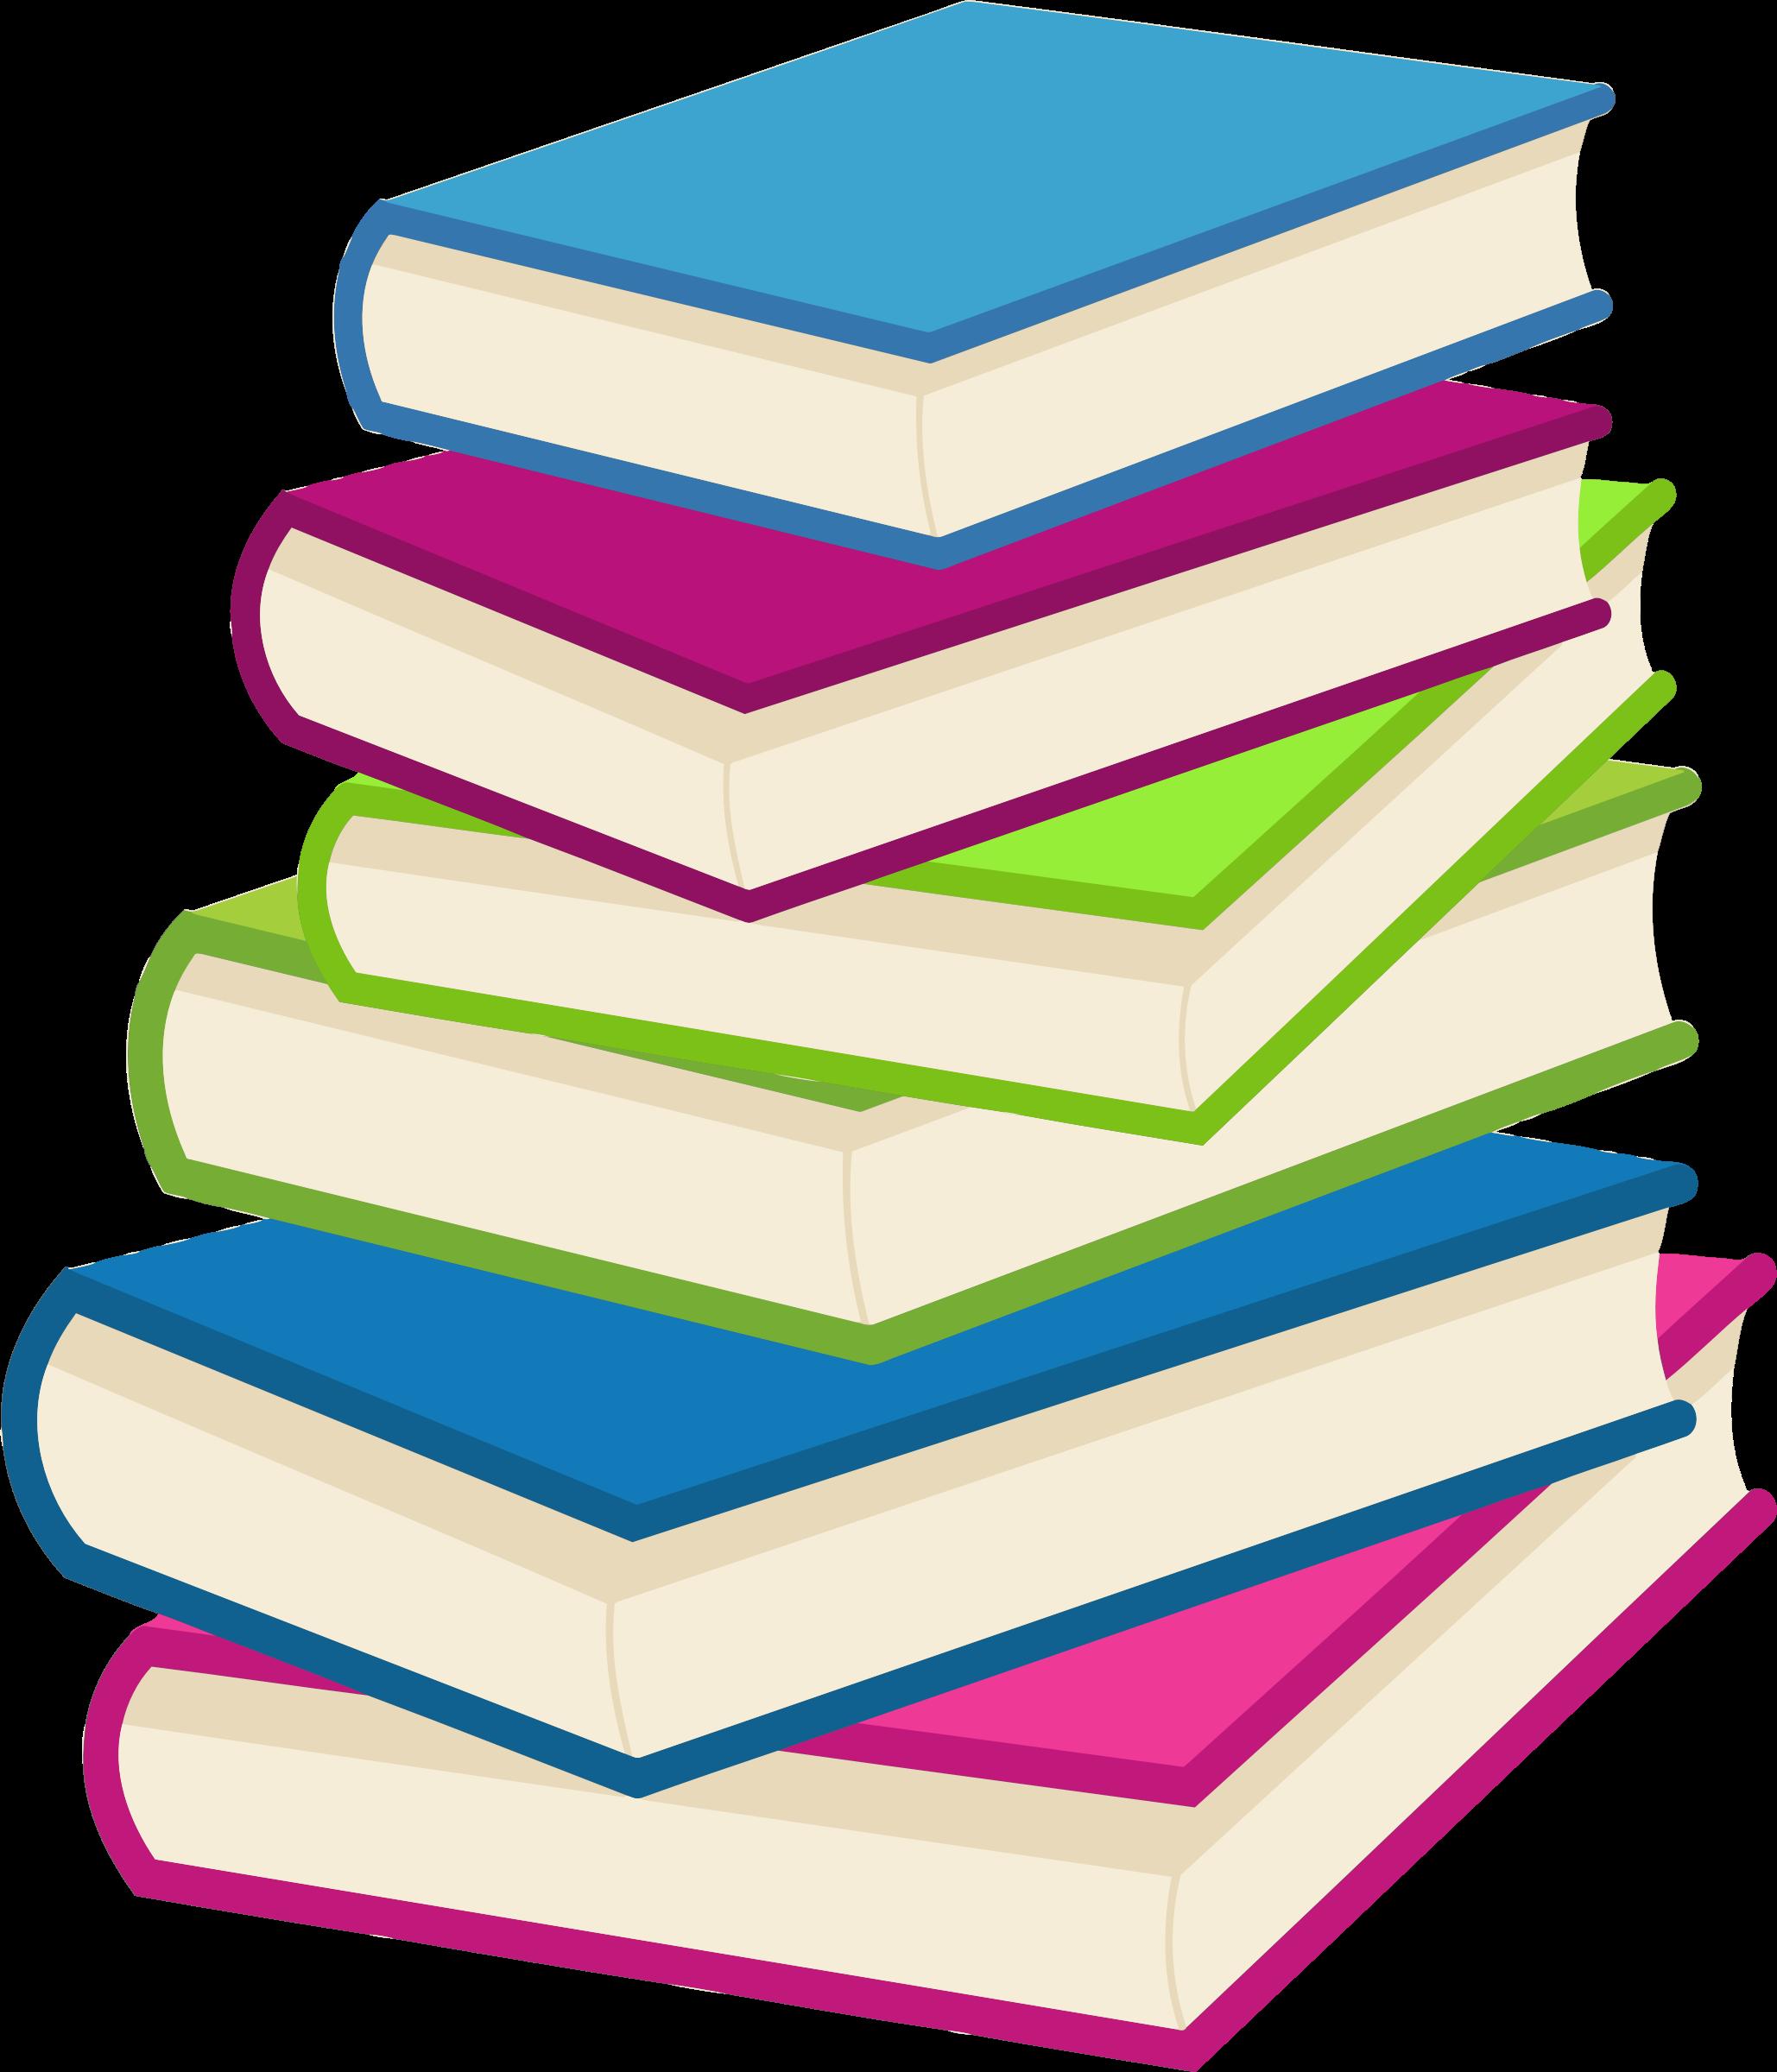 Book sea of memories. Clipart books transparent background